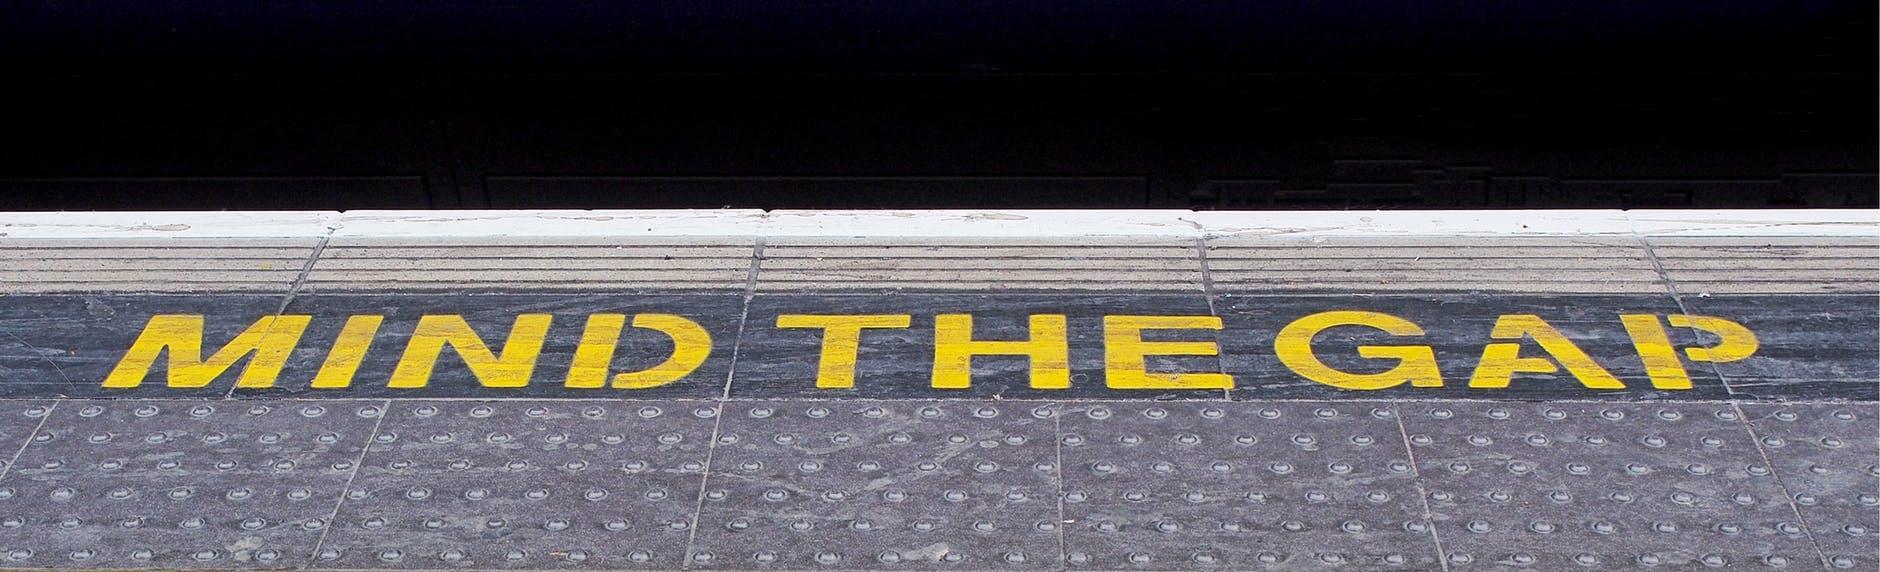 asphalt communication commuter danger